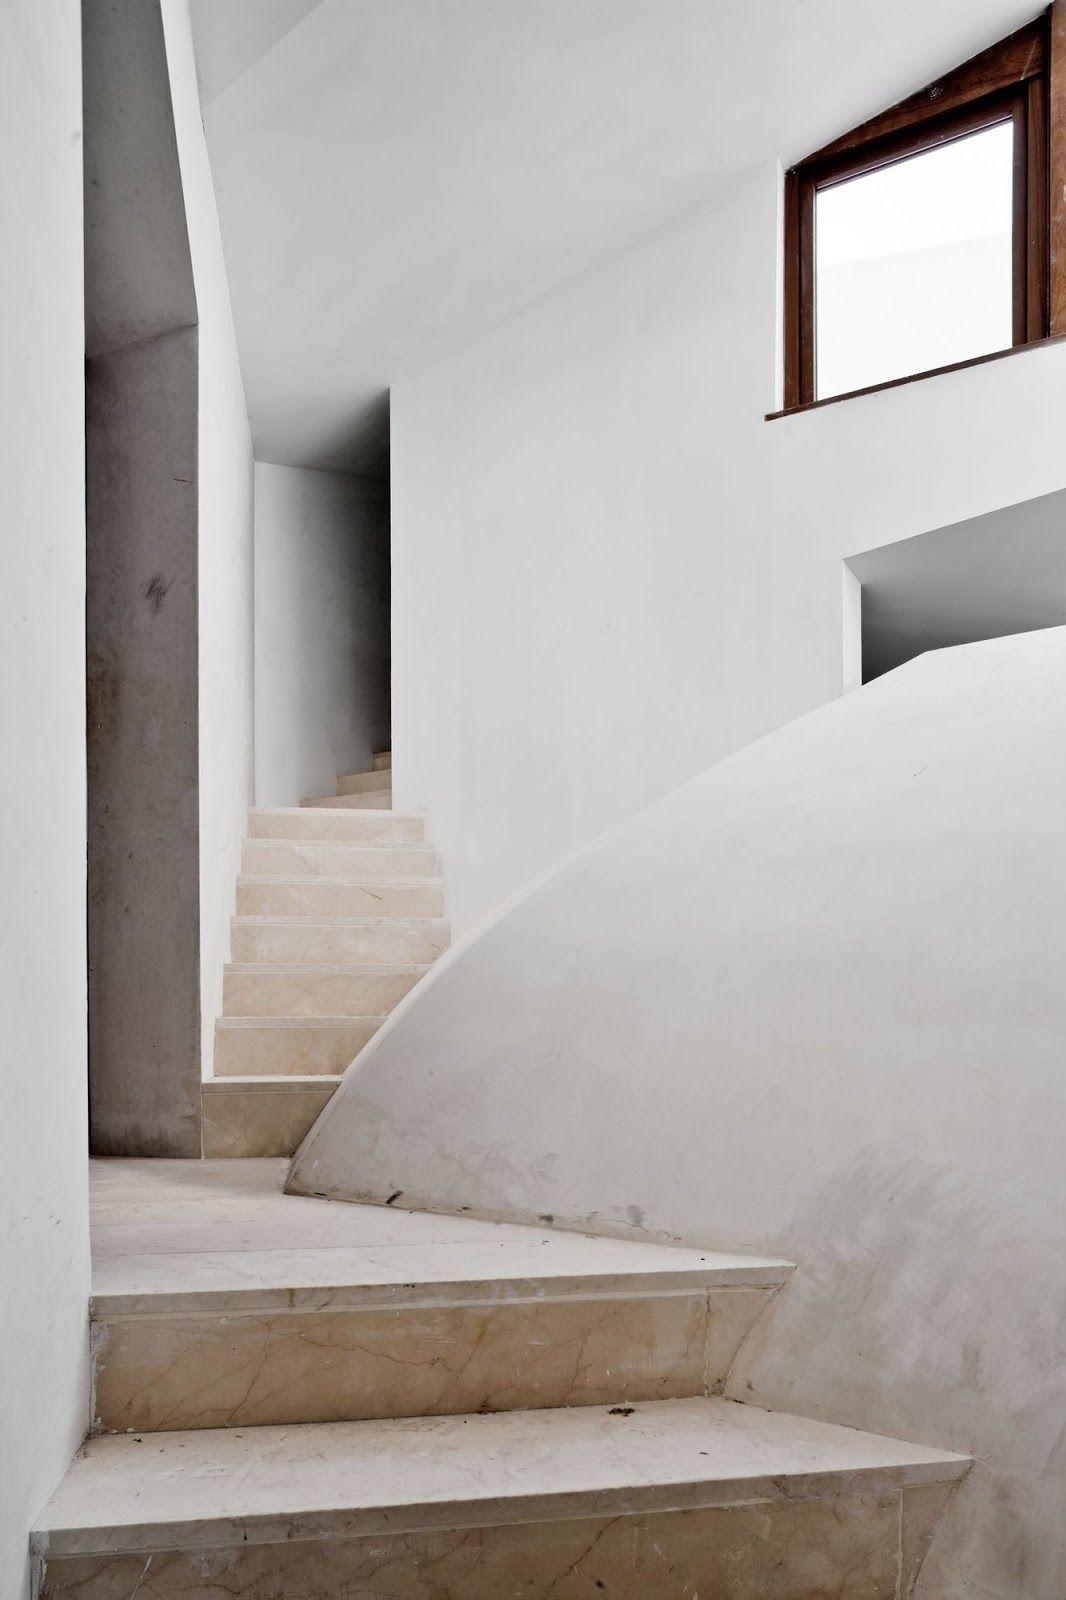 Alvar aalto house interior a f a s i a flores u prats  duch pizá  architecture  random arch